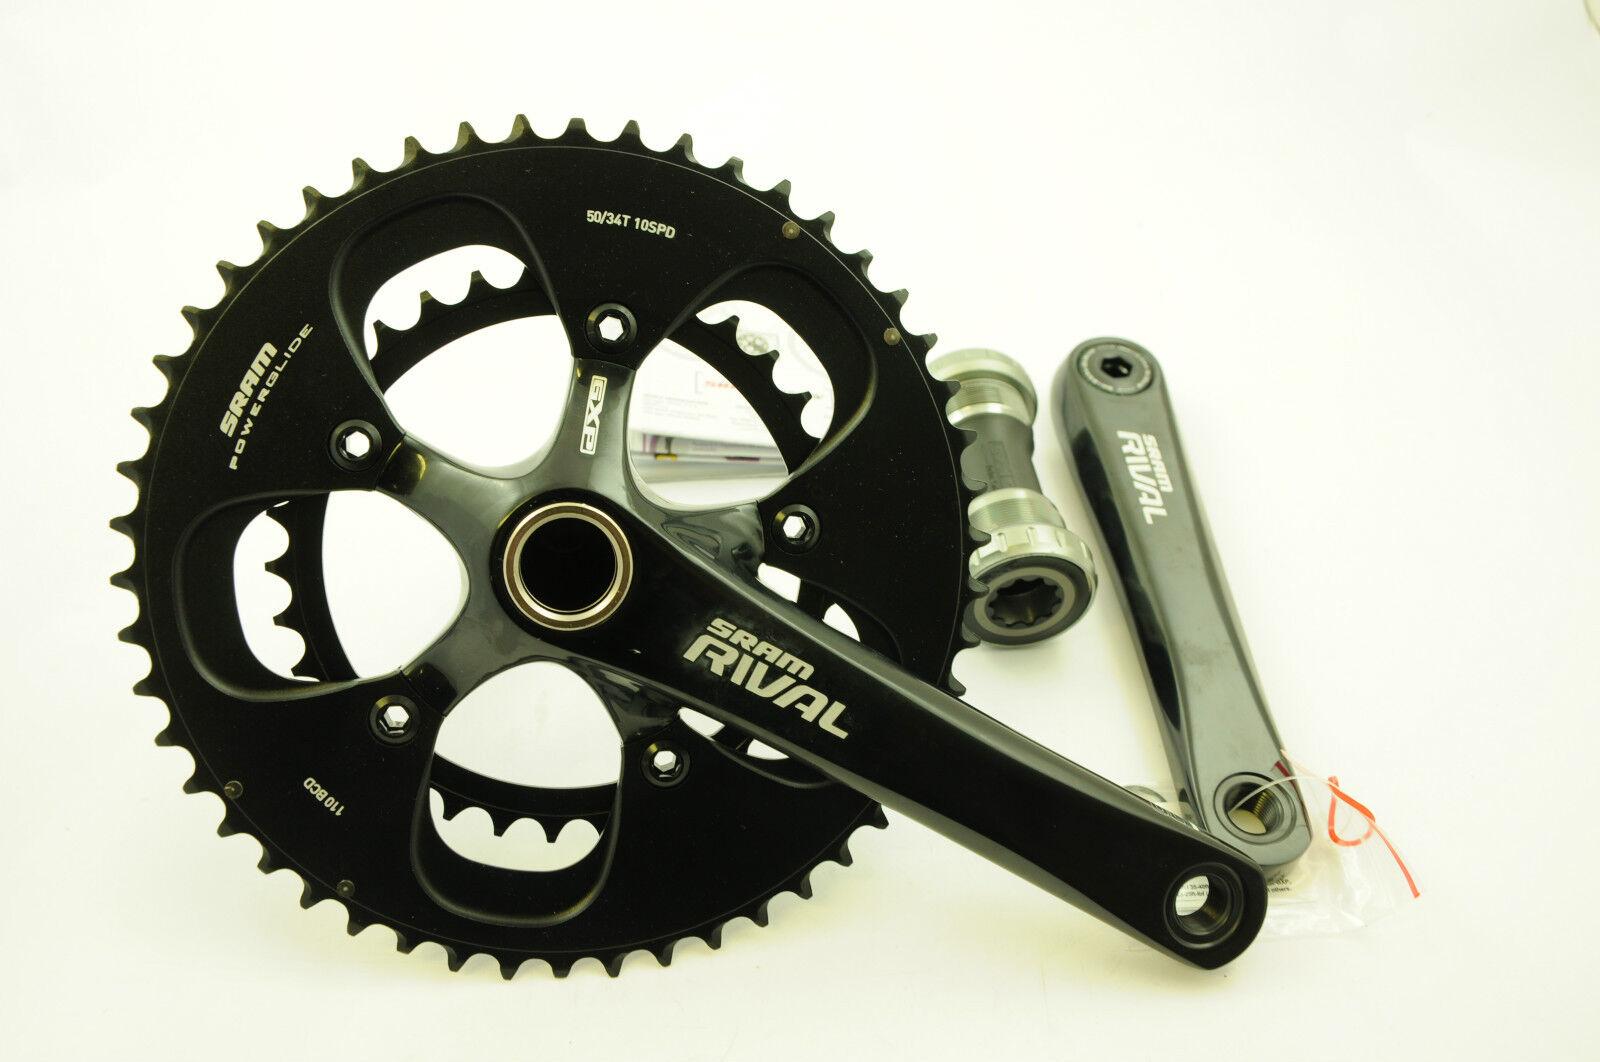 Sram Rival de 172.5 mm chainwheel Set Doble 50 34 Dientes 10 Spd 35% APAGADO PVP